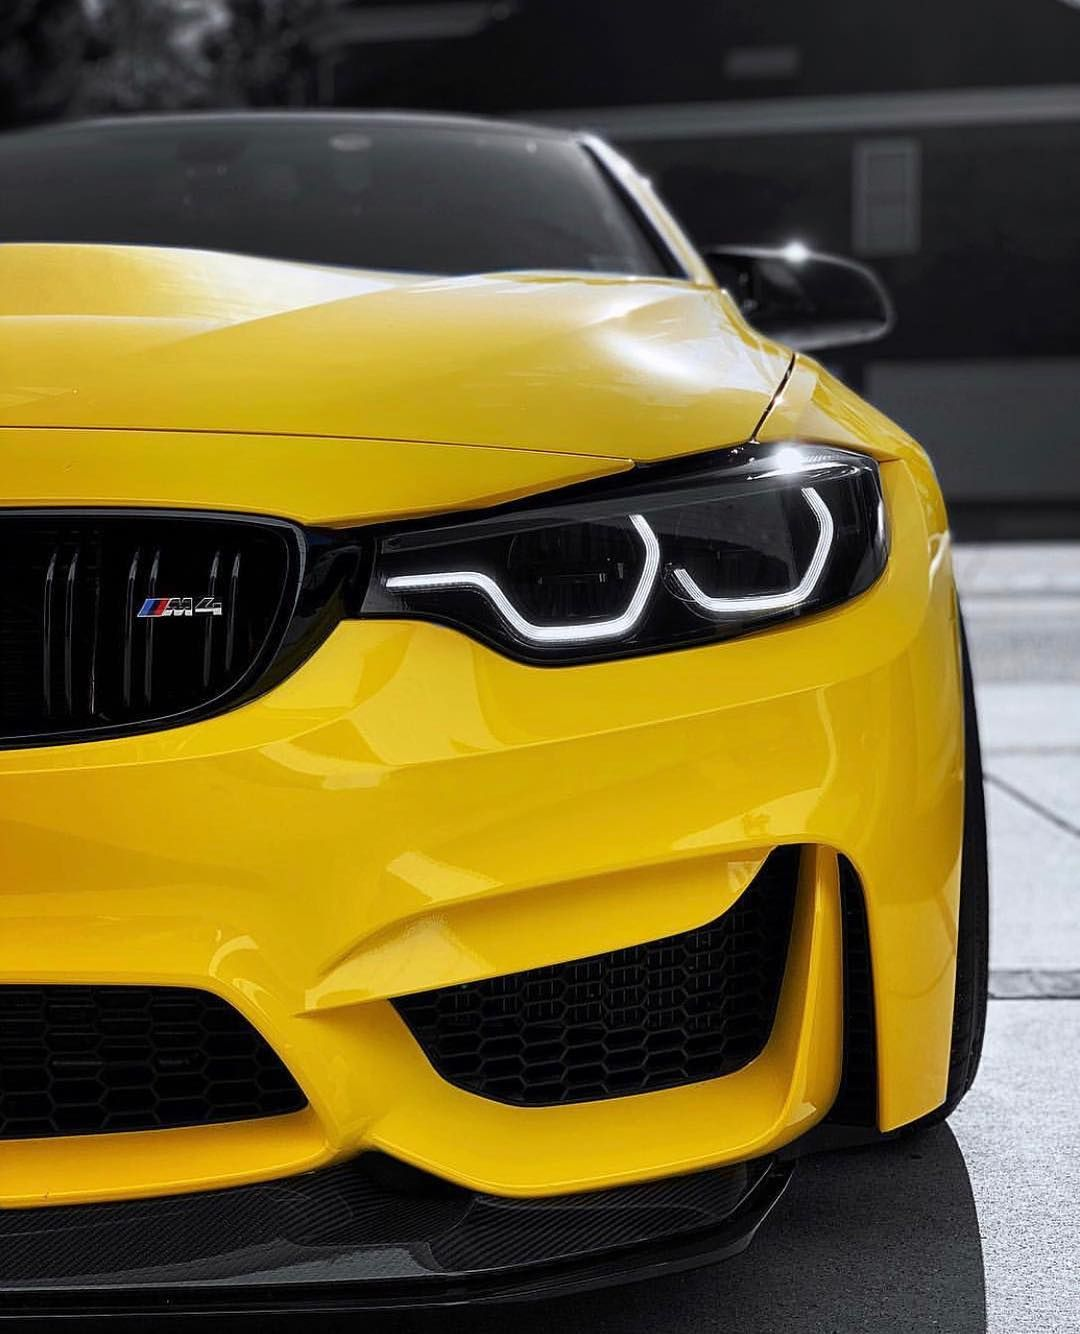 Ferrari F8 Tributo Yellow: BMW F82 M4 GTS In Avery Gloss Yellow Wrap